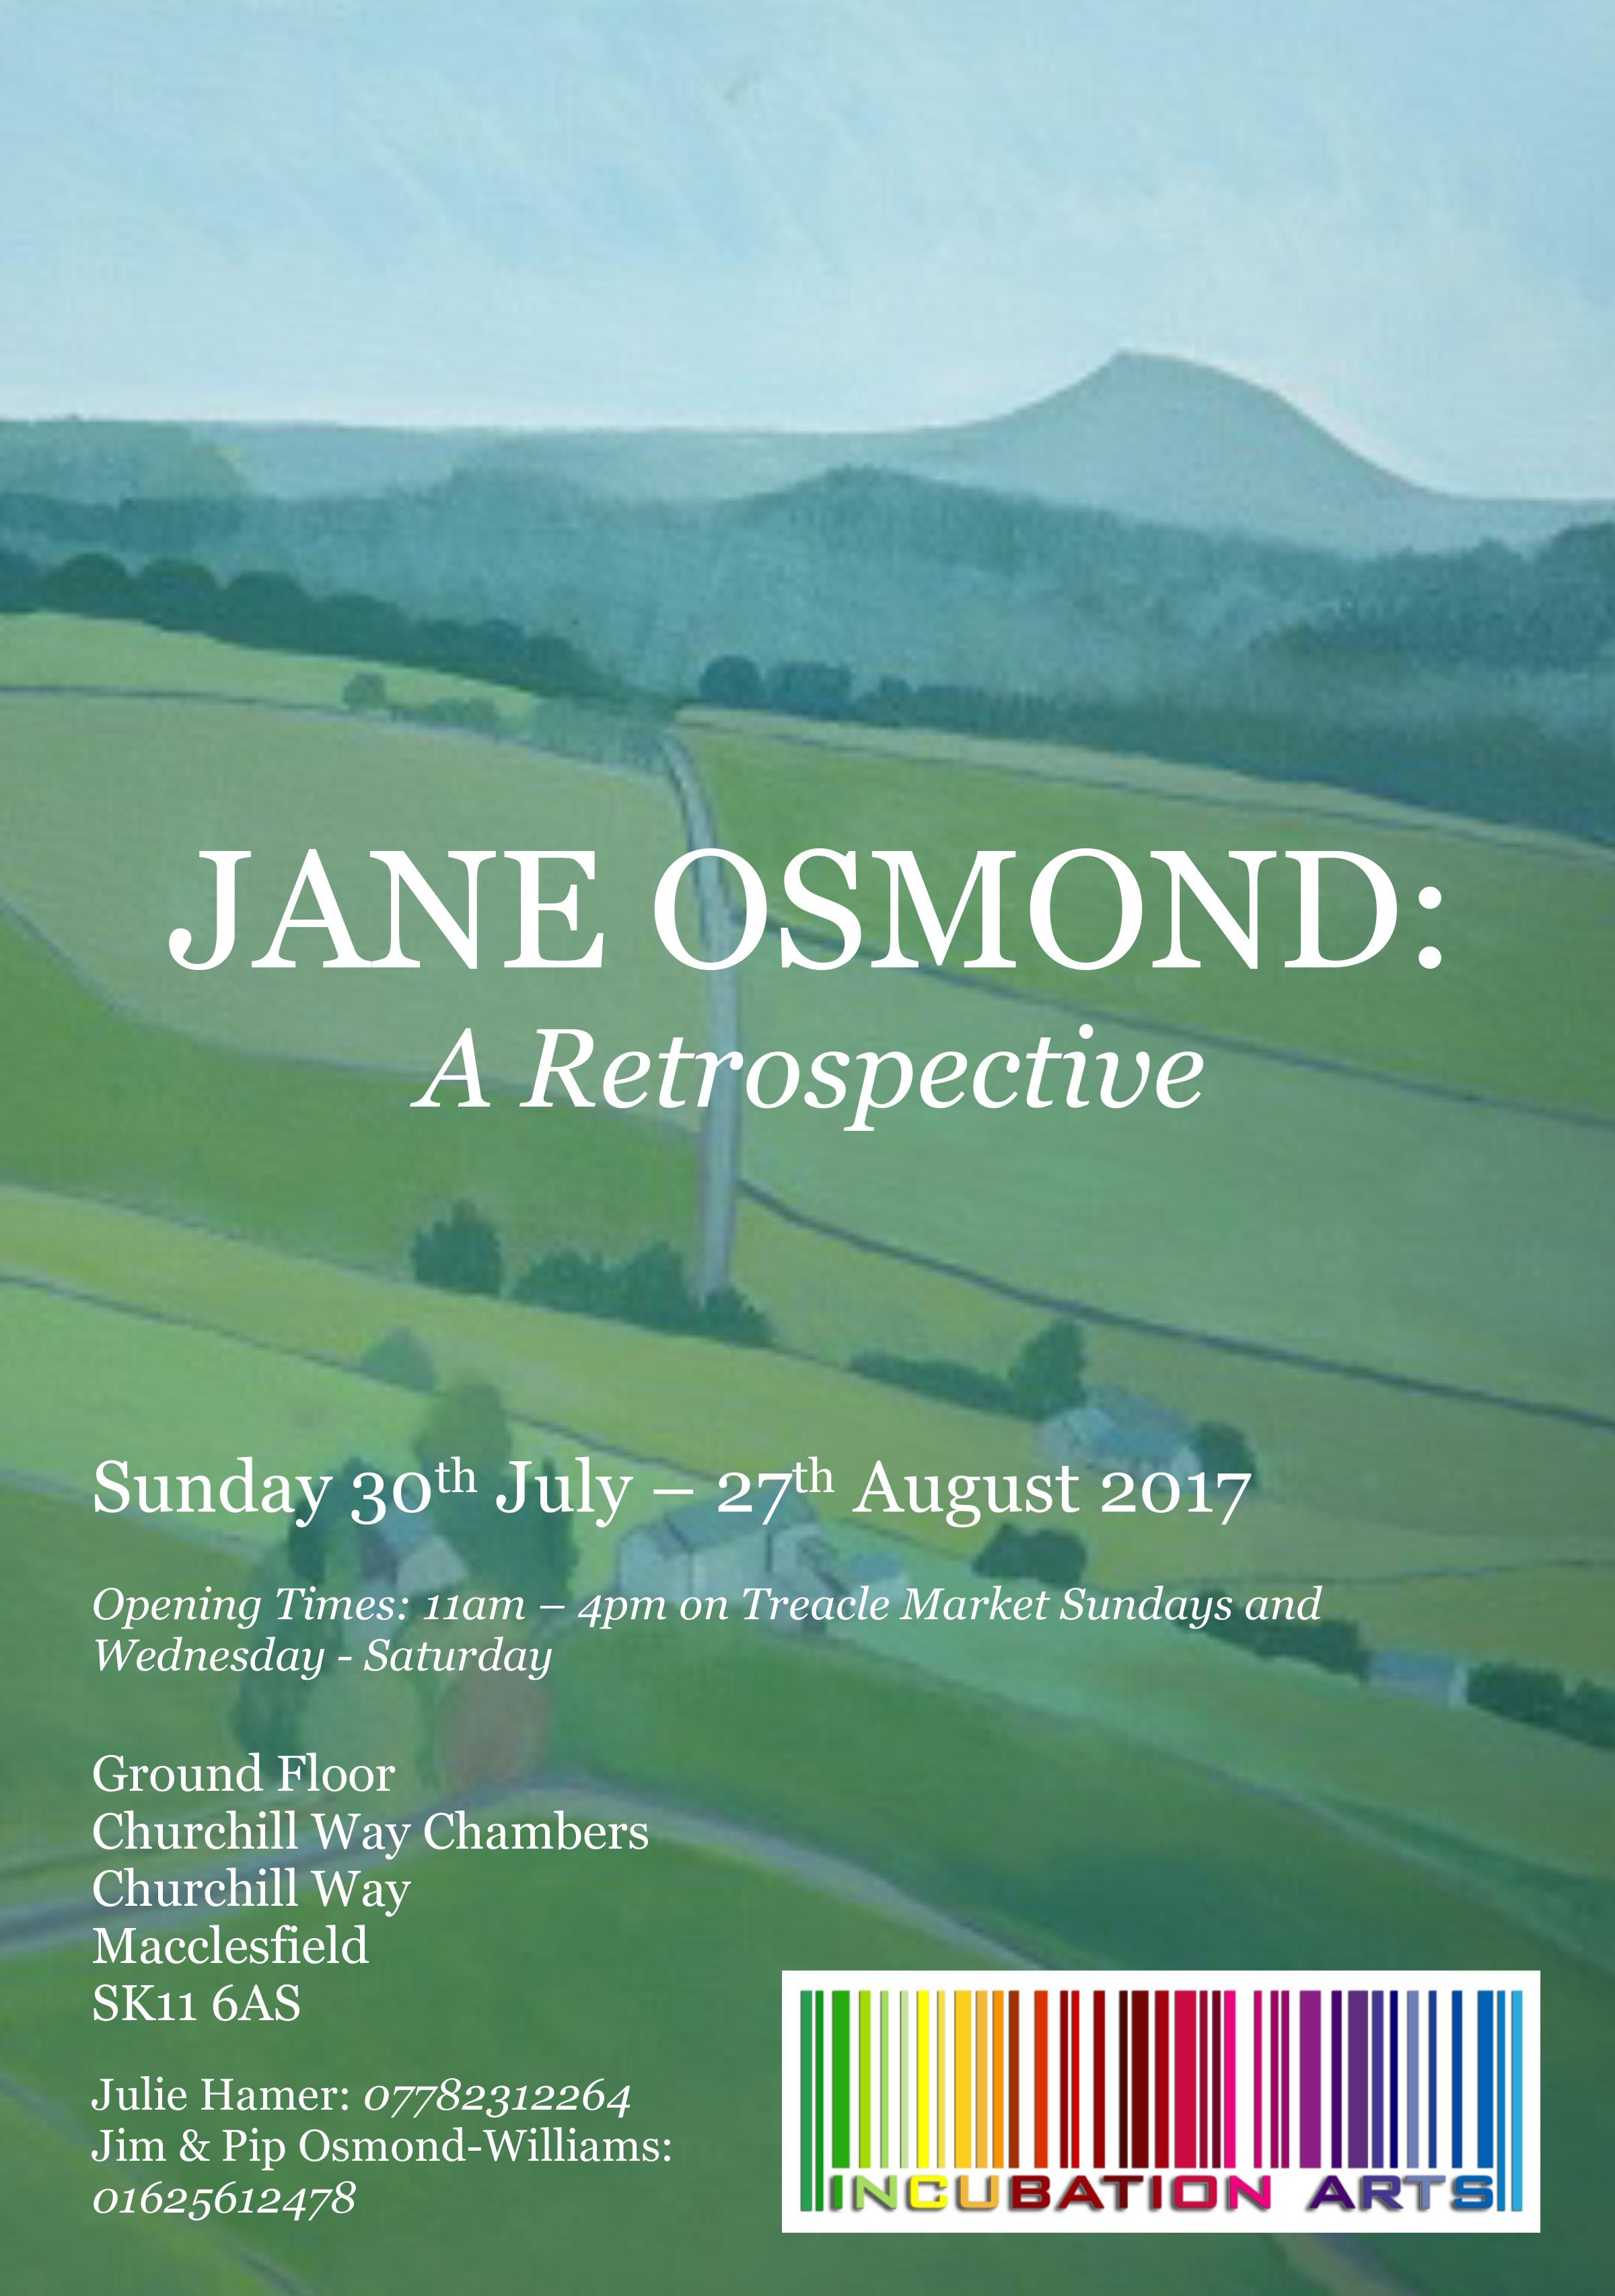 Microsoft Word - Jane Retrospective Poster[9].docx